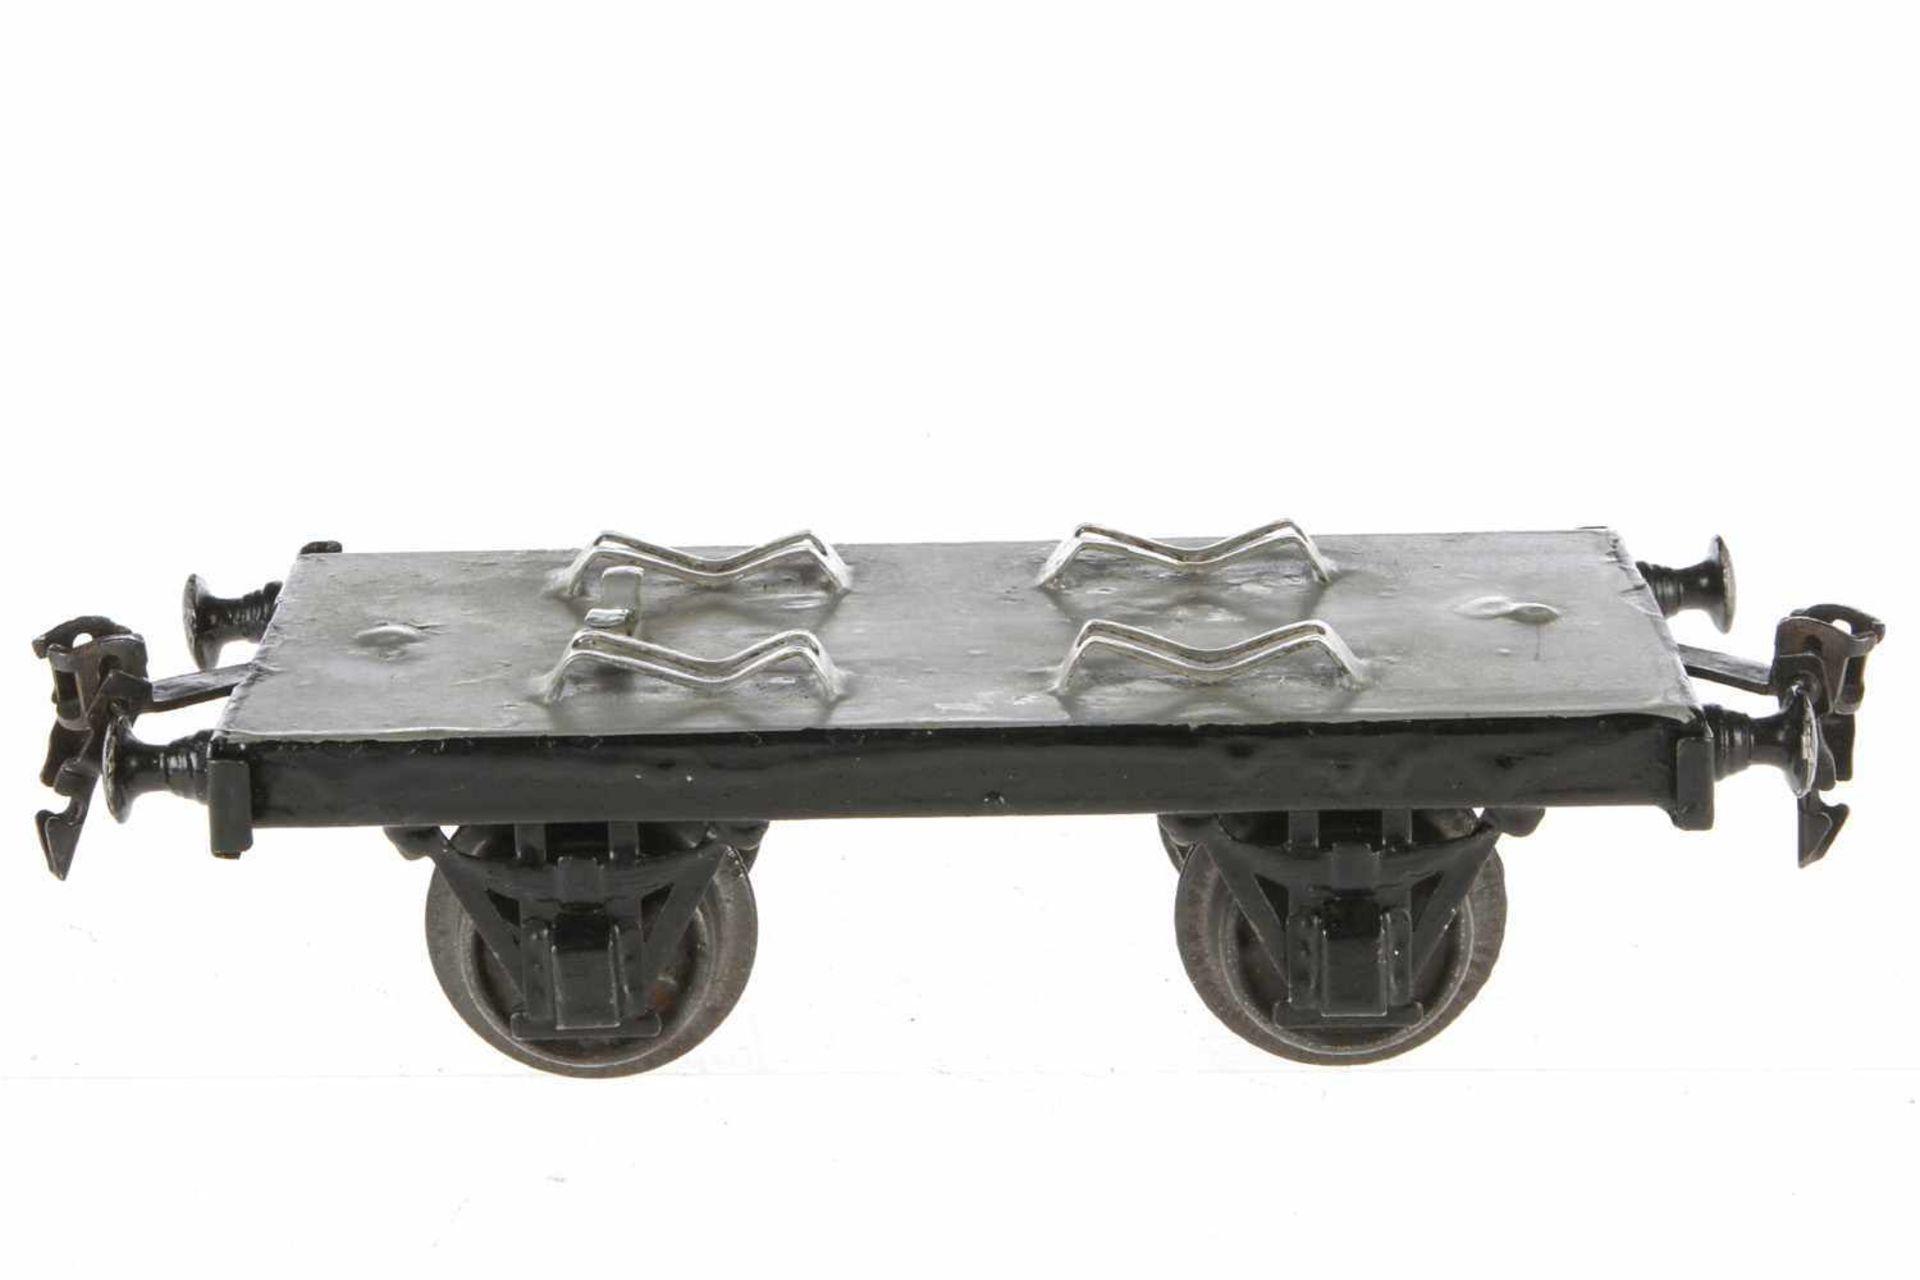 Märklin Militär-Plattformwagen 1825, S 1, uralt, HL, LS tw ausgebessert, L 18, Z 2-3